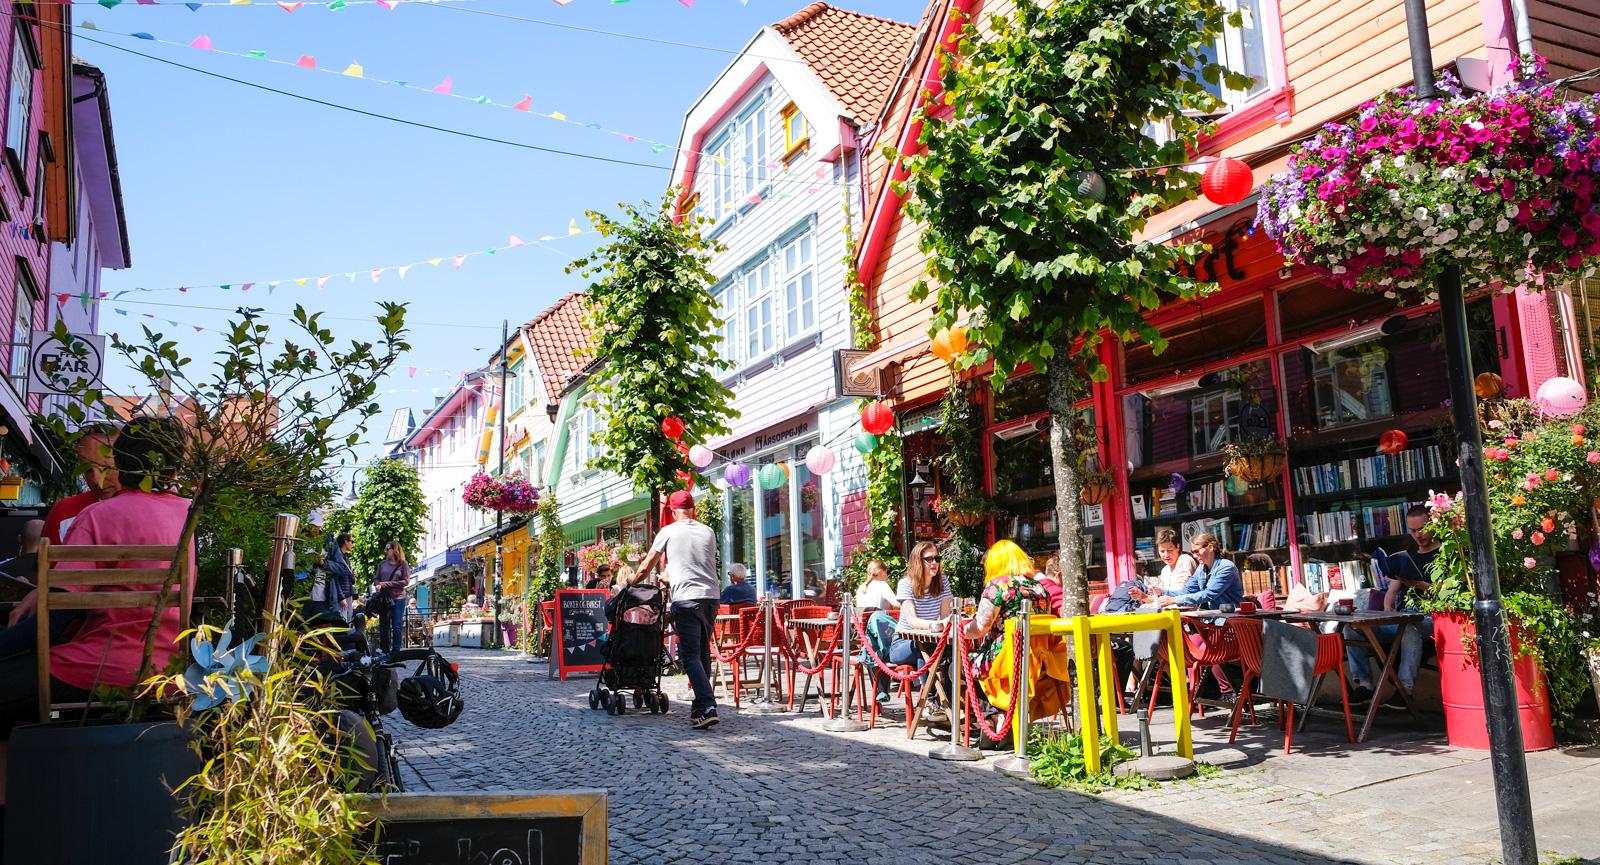 Kontinentalt kaféliv hittar du i Stavangers östra delar.